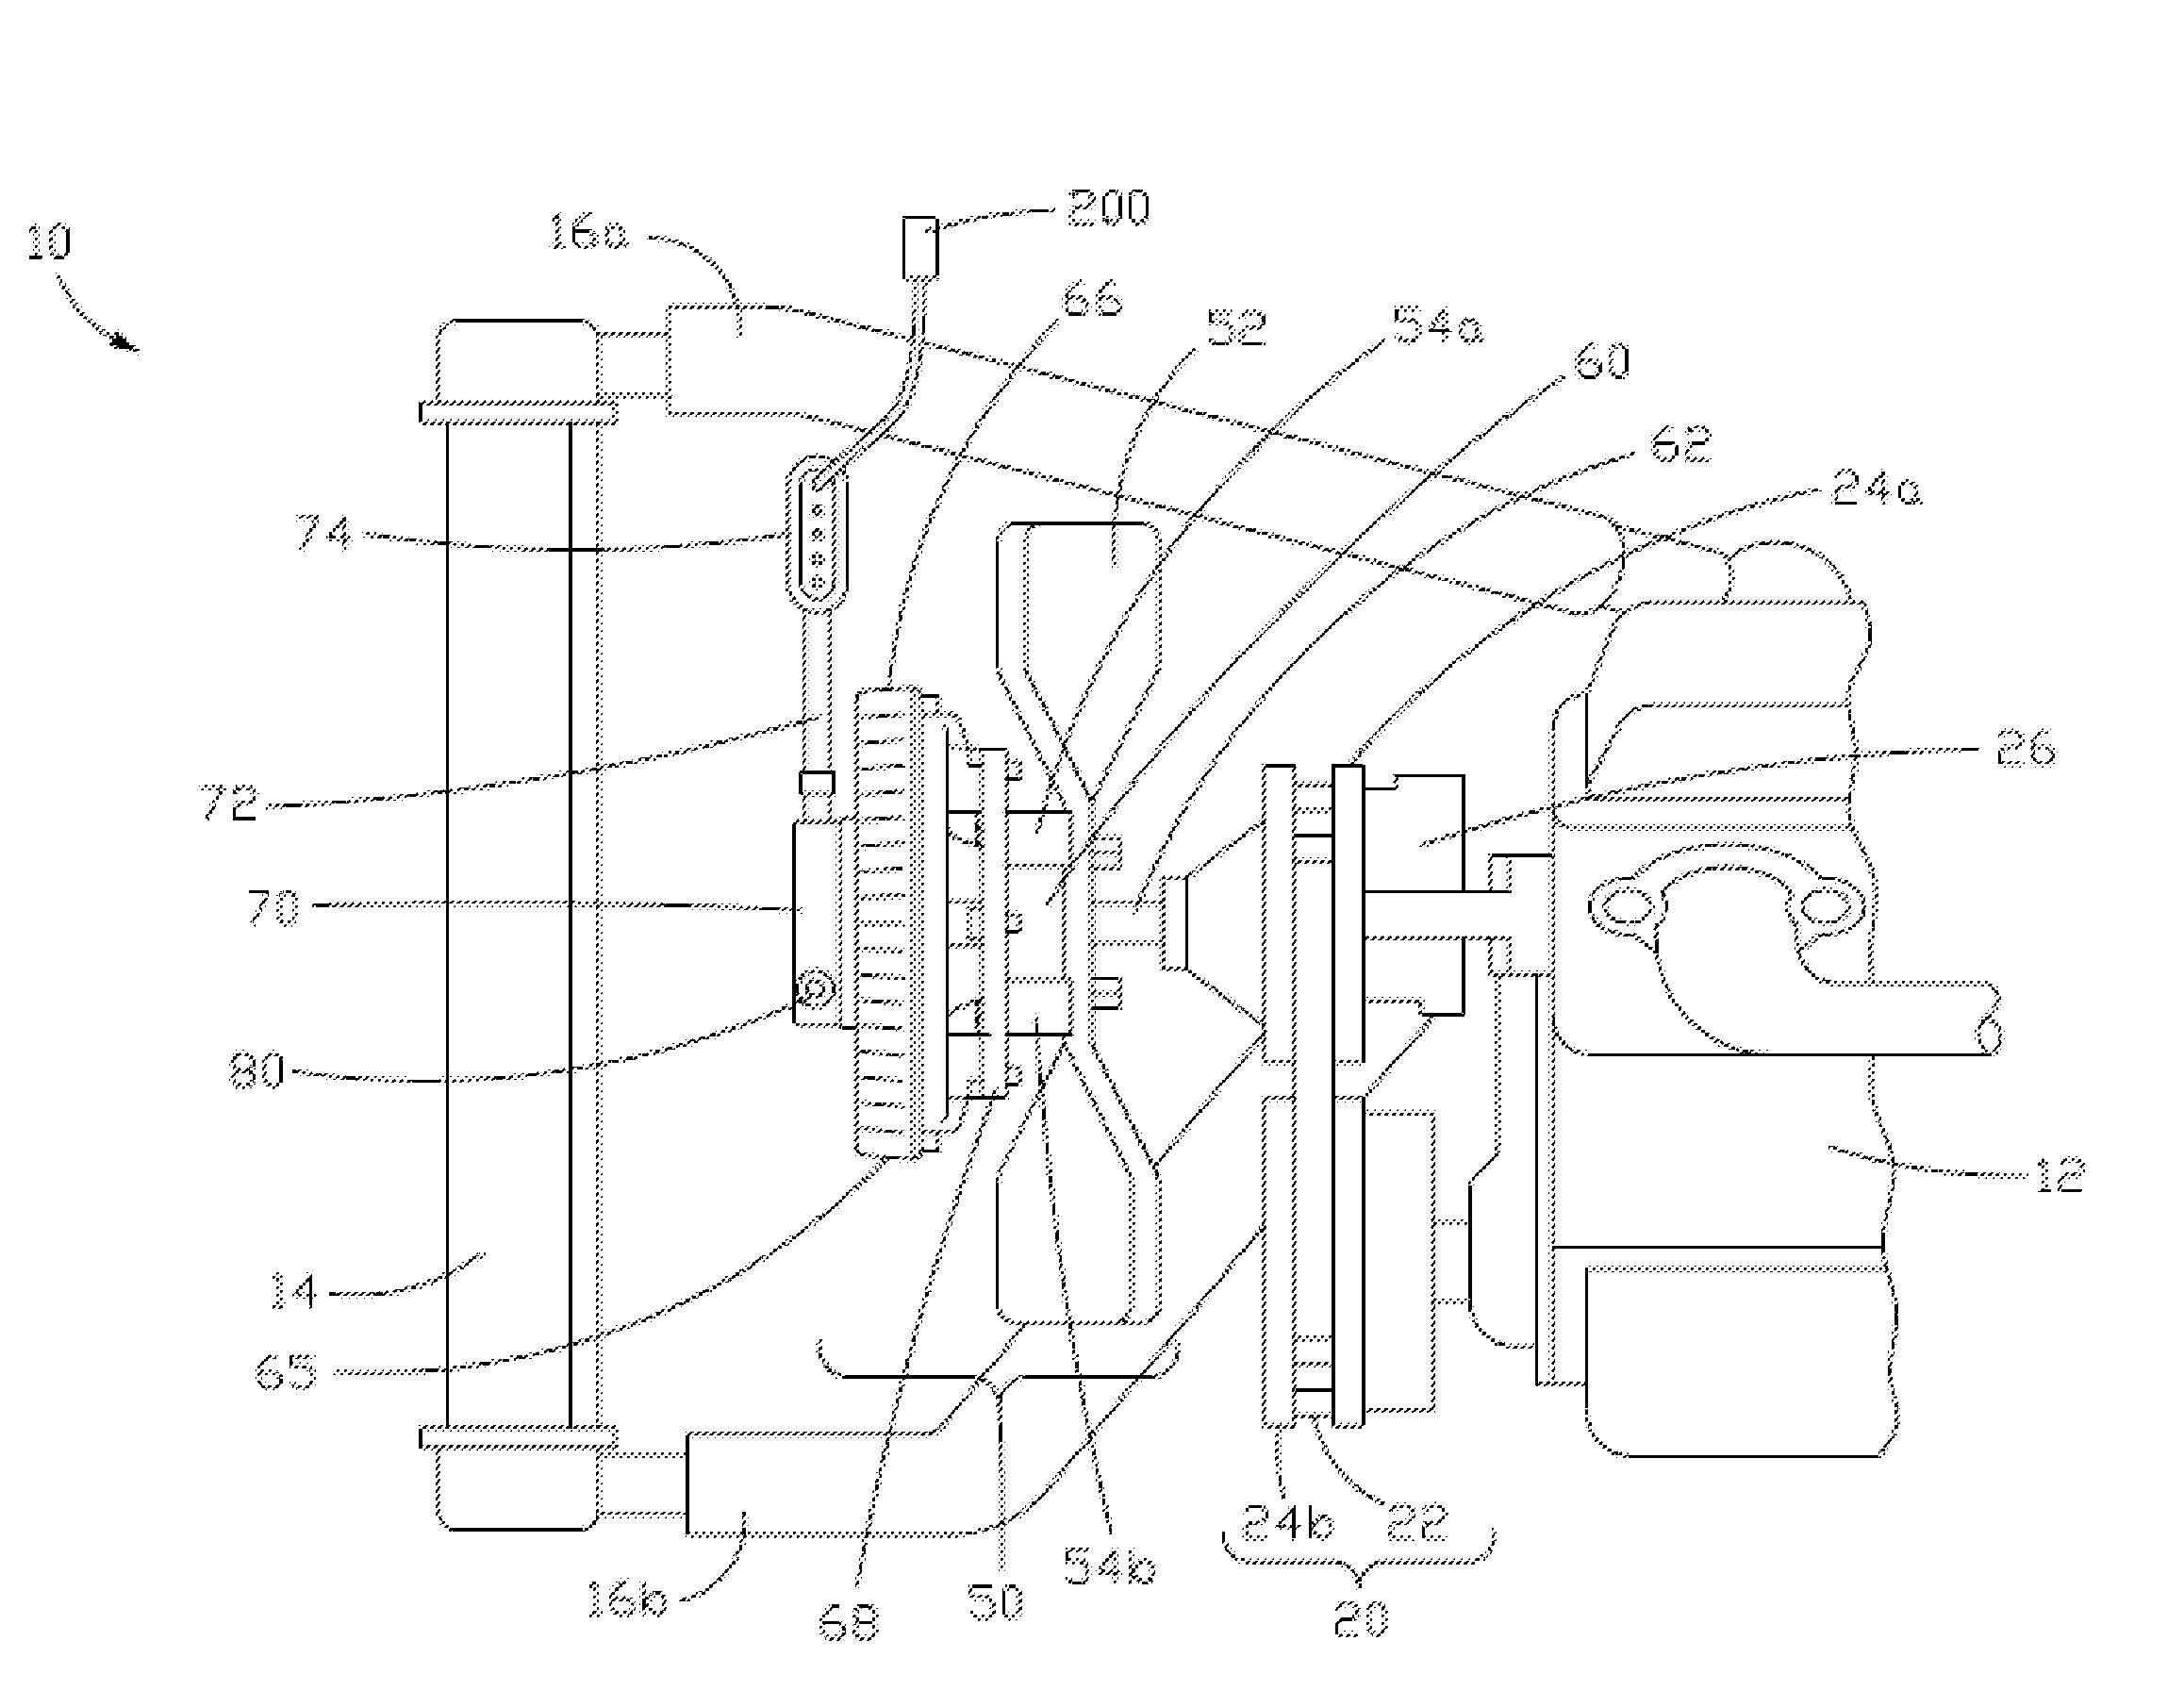 Detroit Series 60 Ddec 1 Ecm Wiring Diagram | Wiring Diagram Database